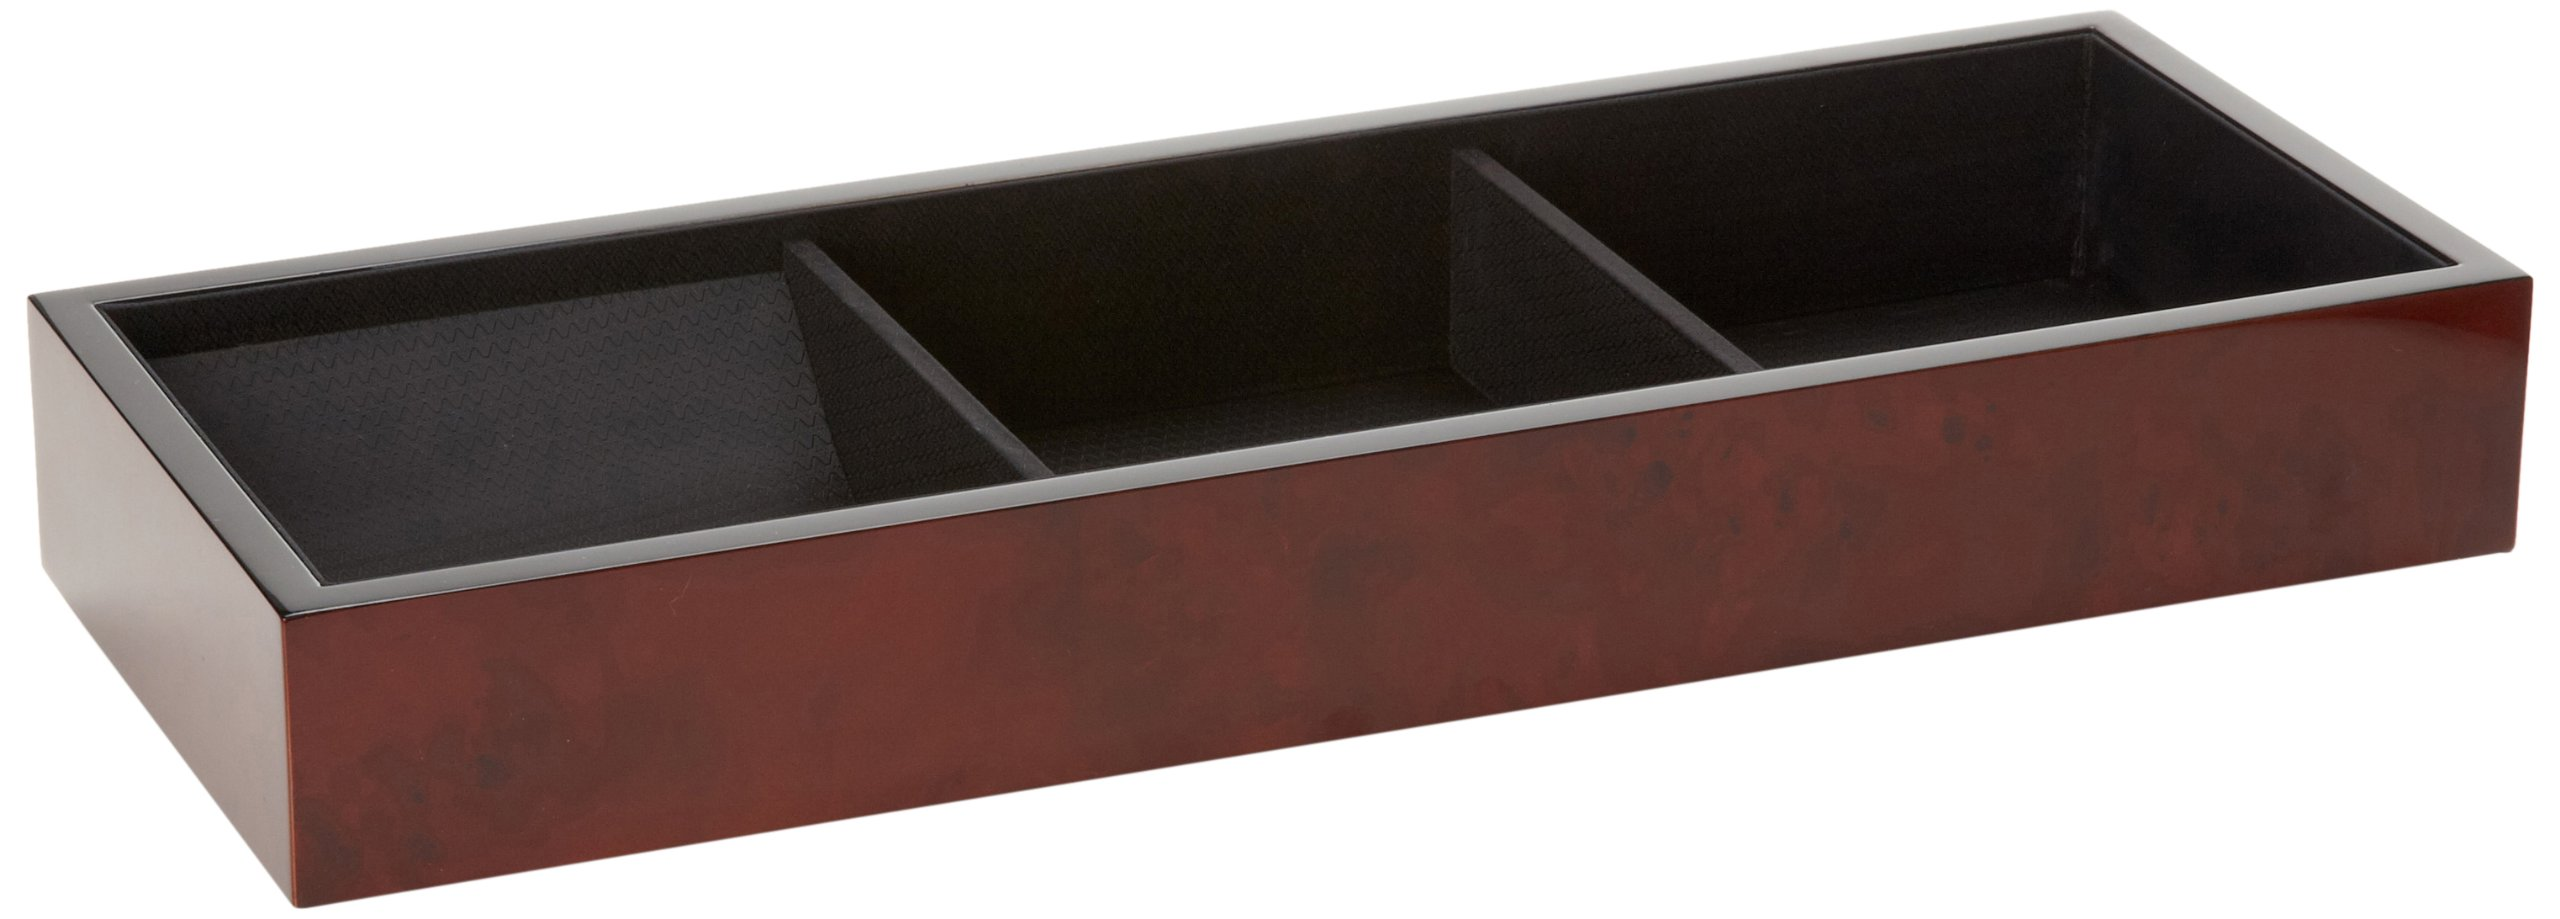 Wolf Designs WOLF 460210 Meridian Top Tray, Burlwood